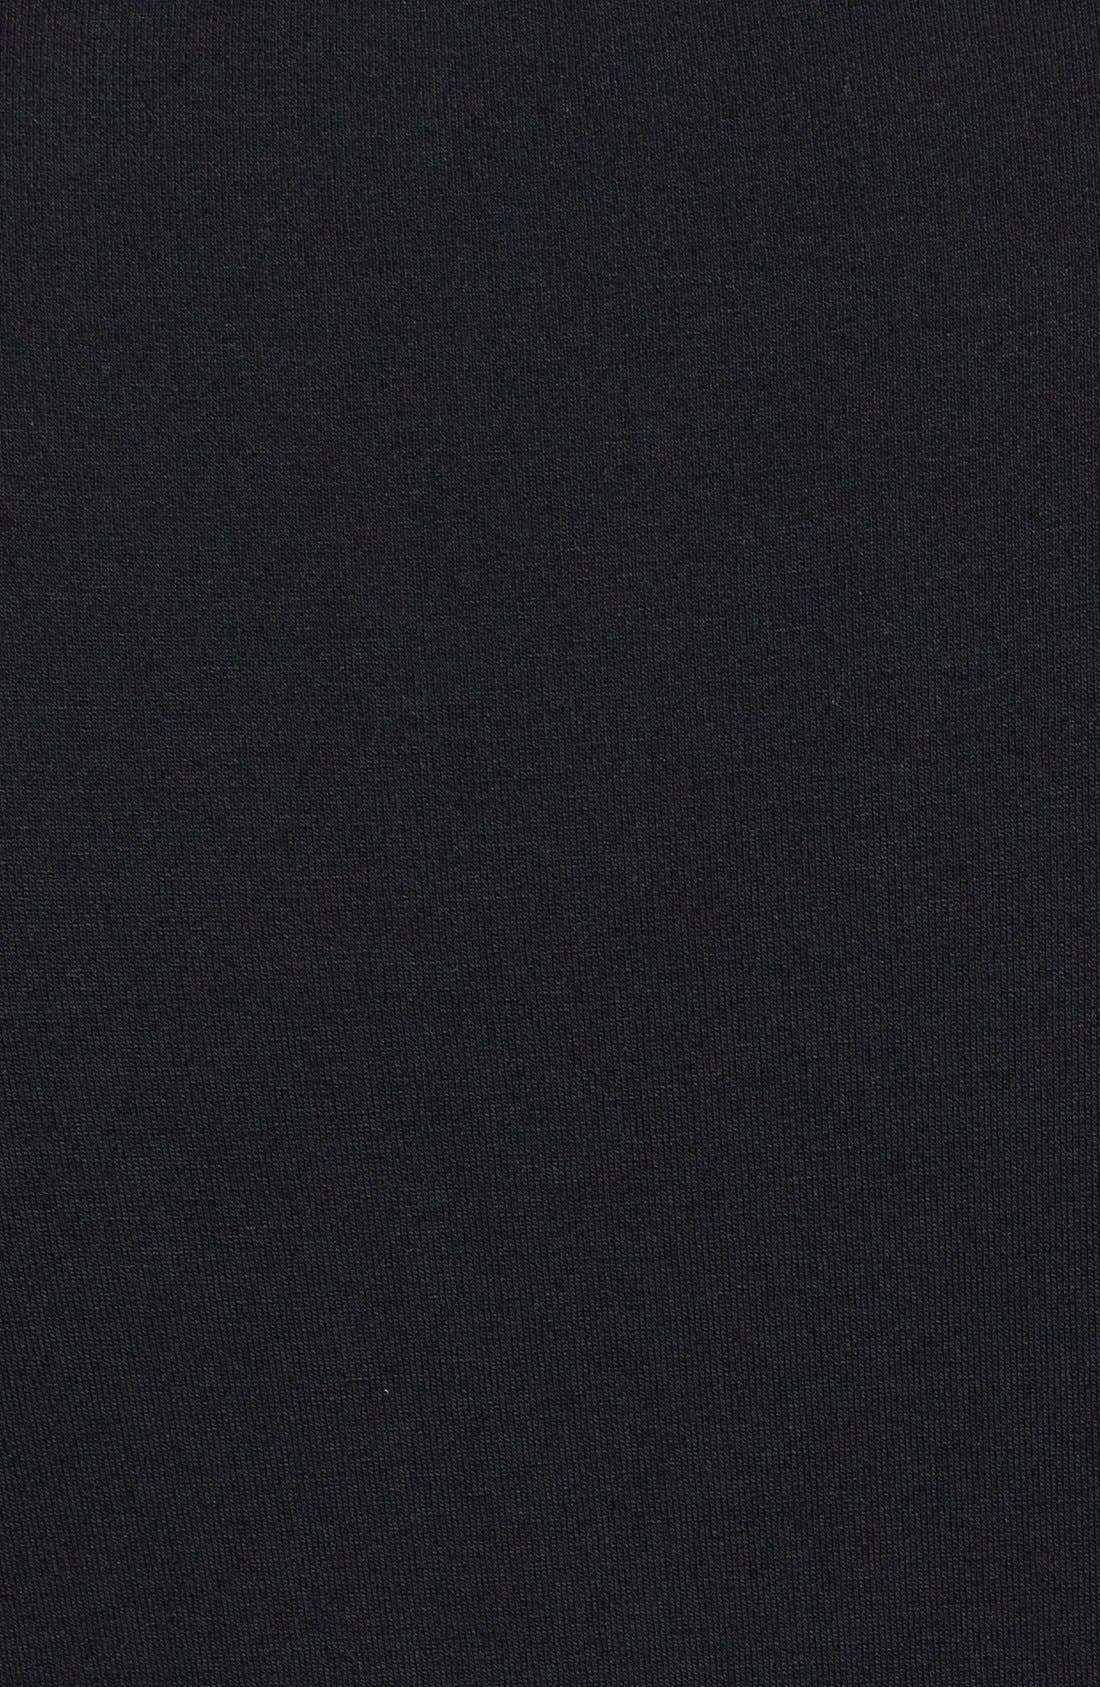 Alternate Image 3  - Vince Camuto Mesh Inset Maxi Dress (Plus Size)